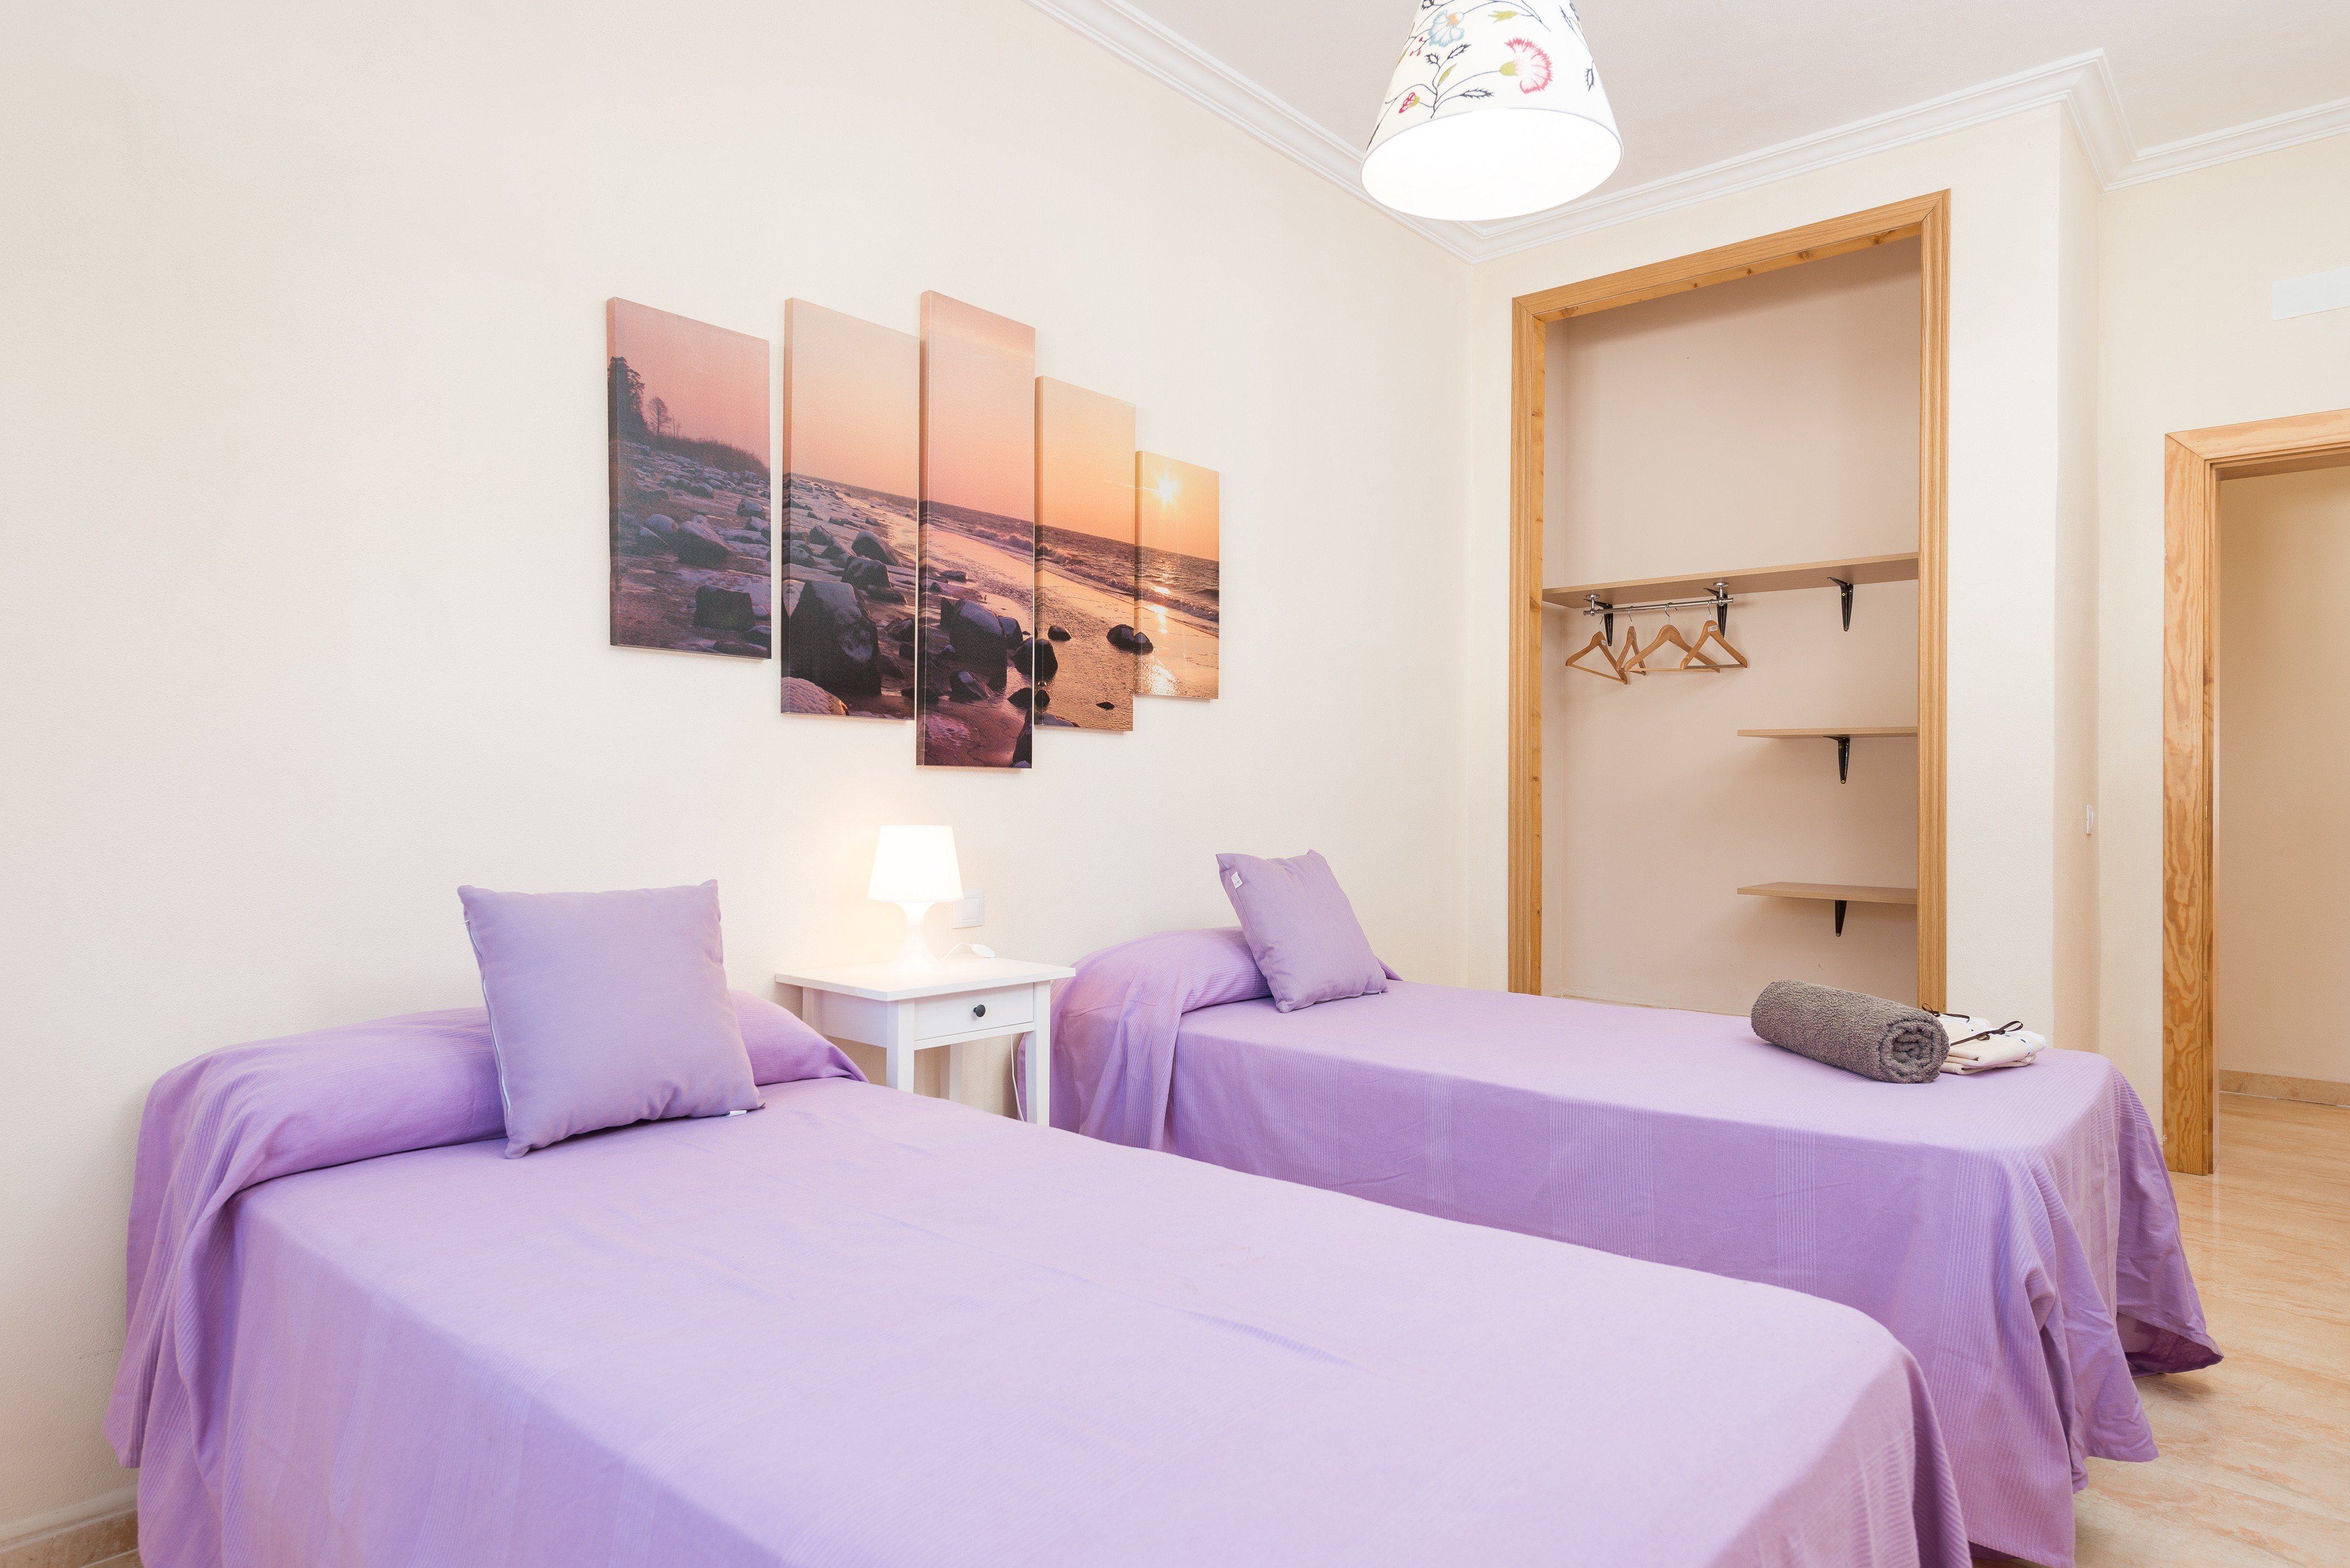 Ferienhaus CAN MOLINA (2063640), Cala Mandia, Mallorca, Balearische Inseln, Spanien, Bild 28